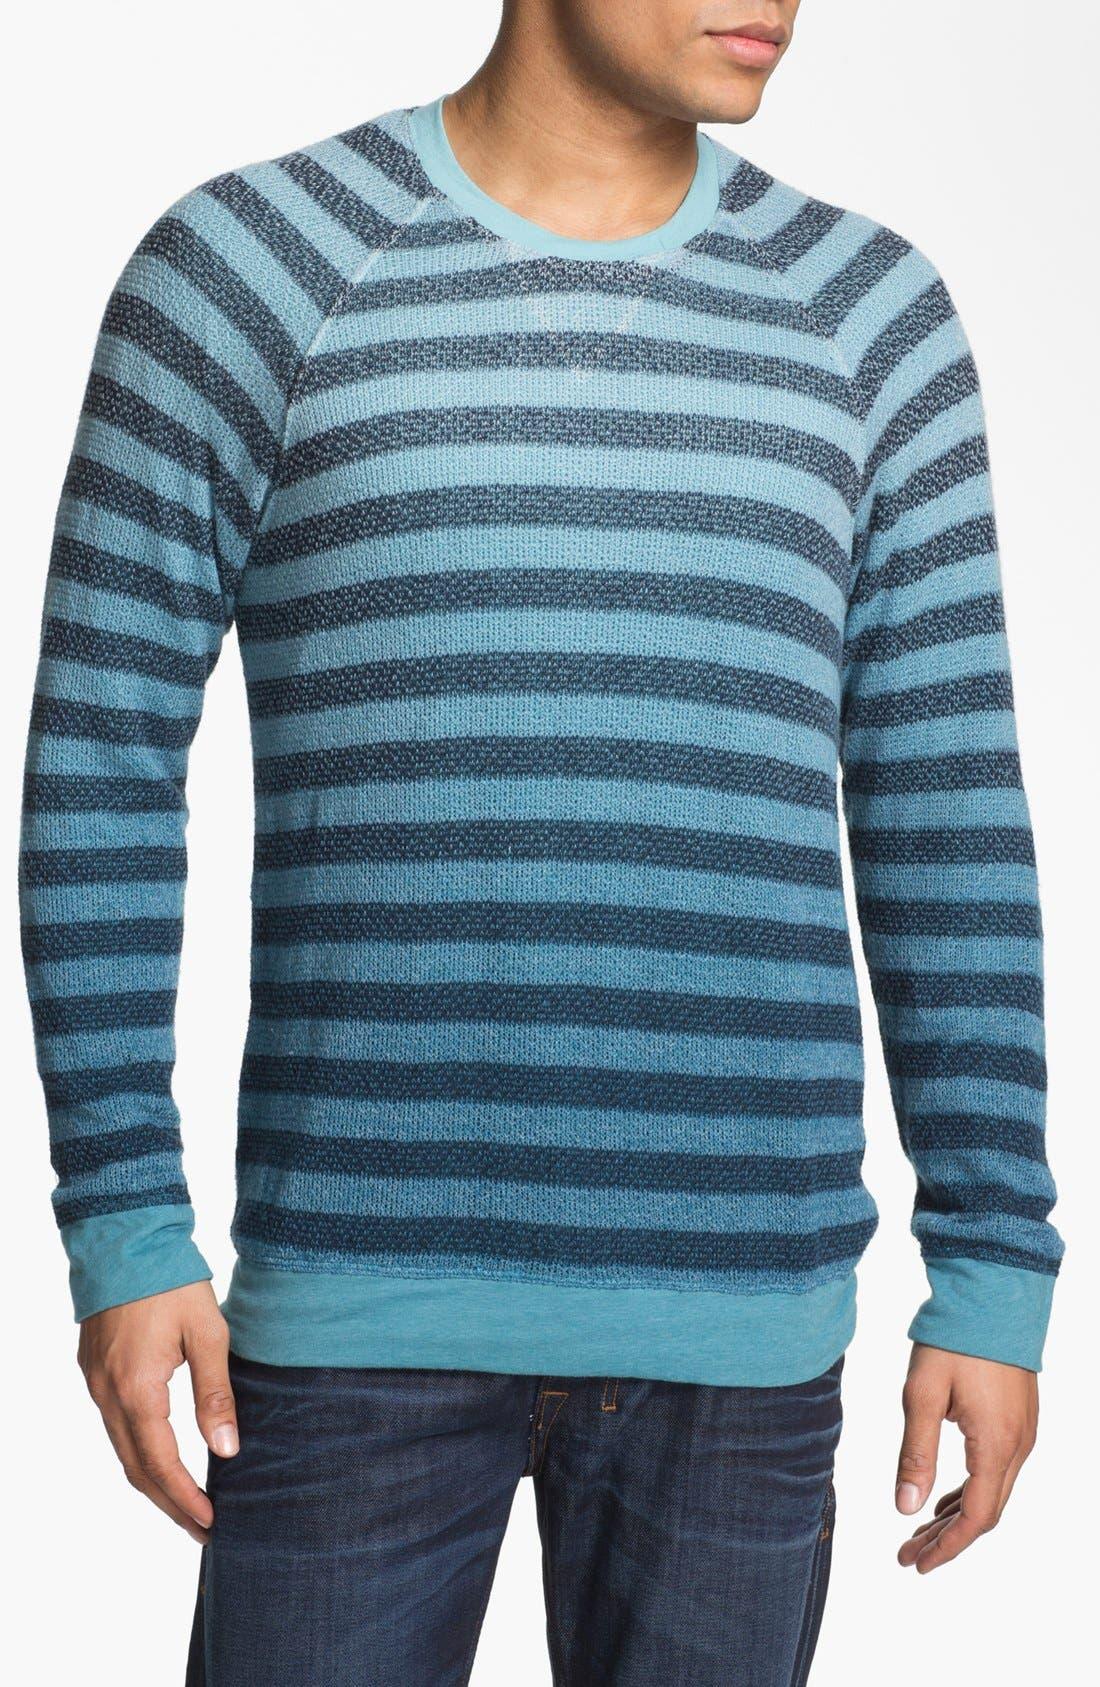 Main Image - Gypsy 05 Reversible Crewneck Sweater